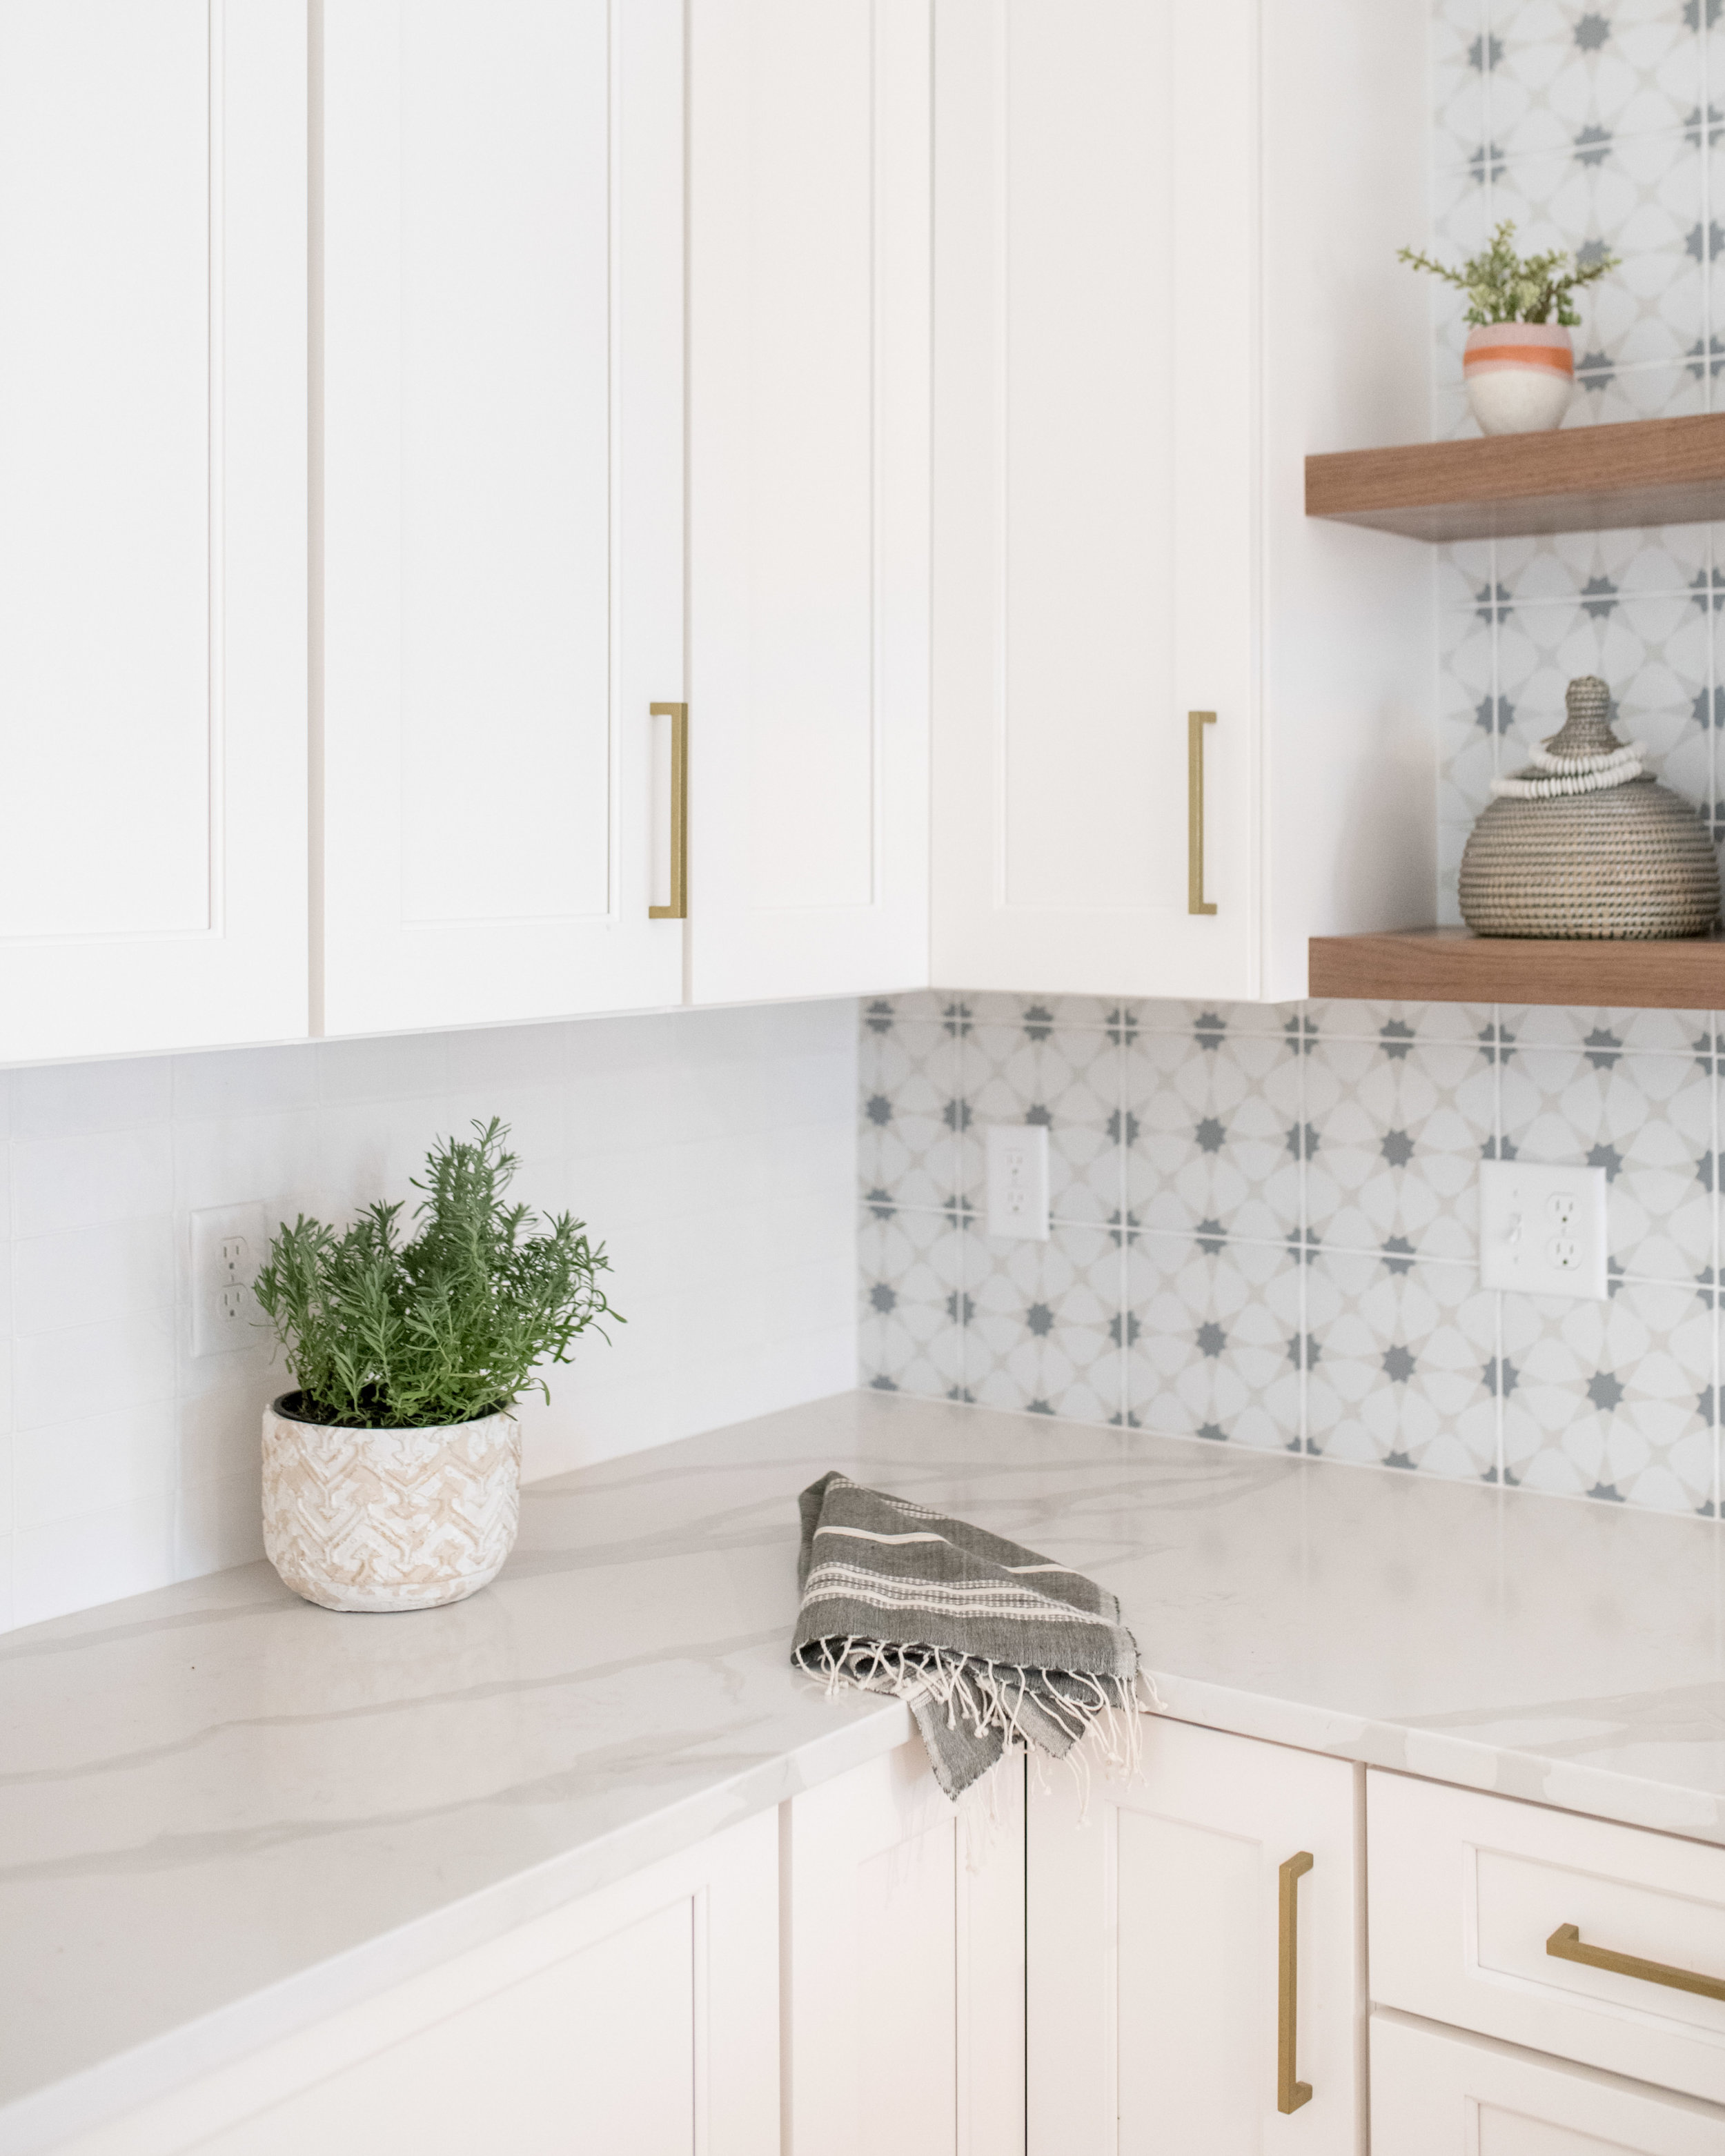 quartz countertops and graphic backsplash